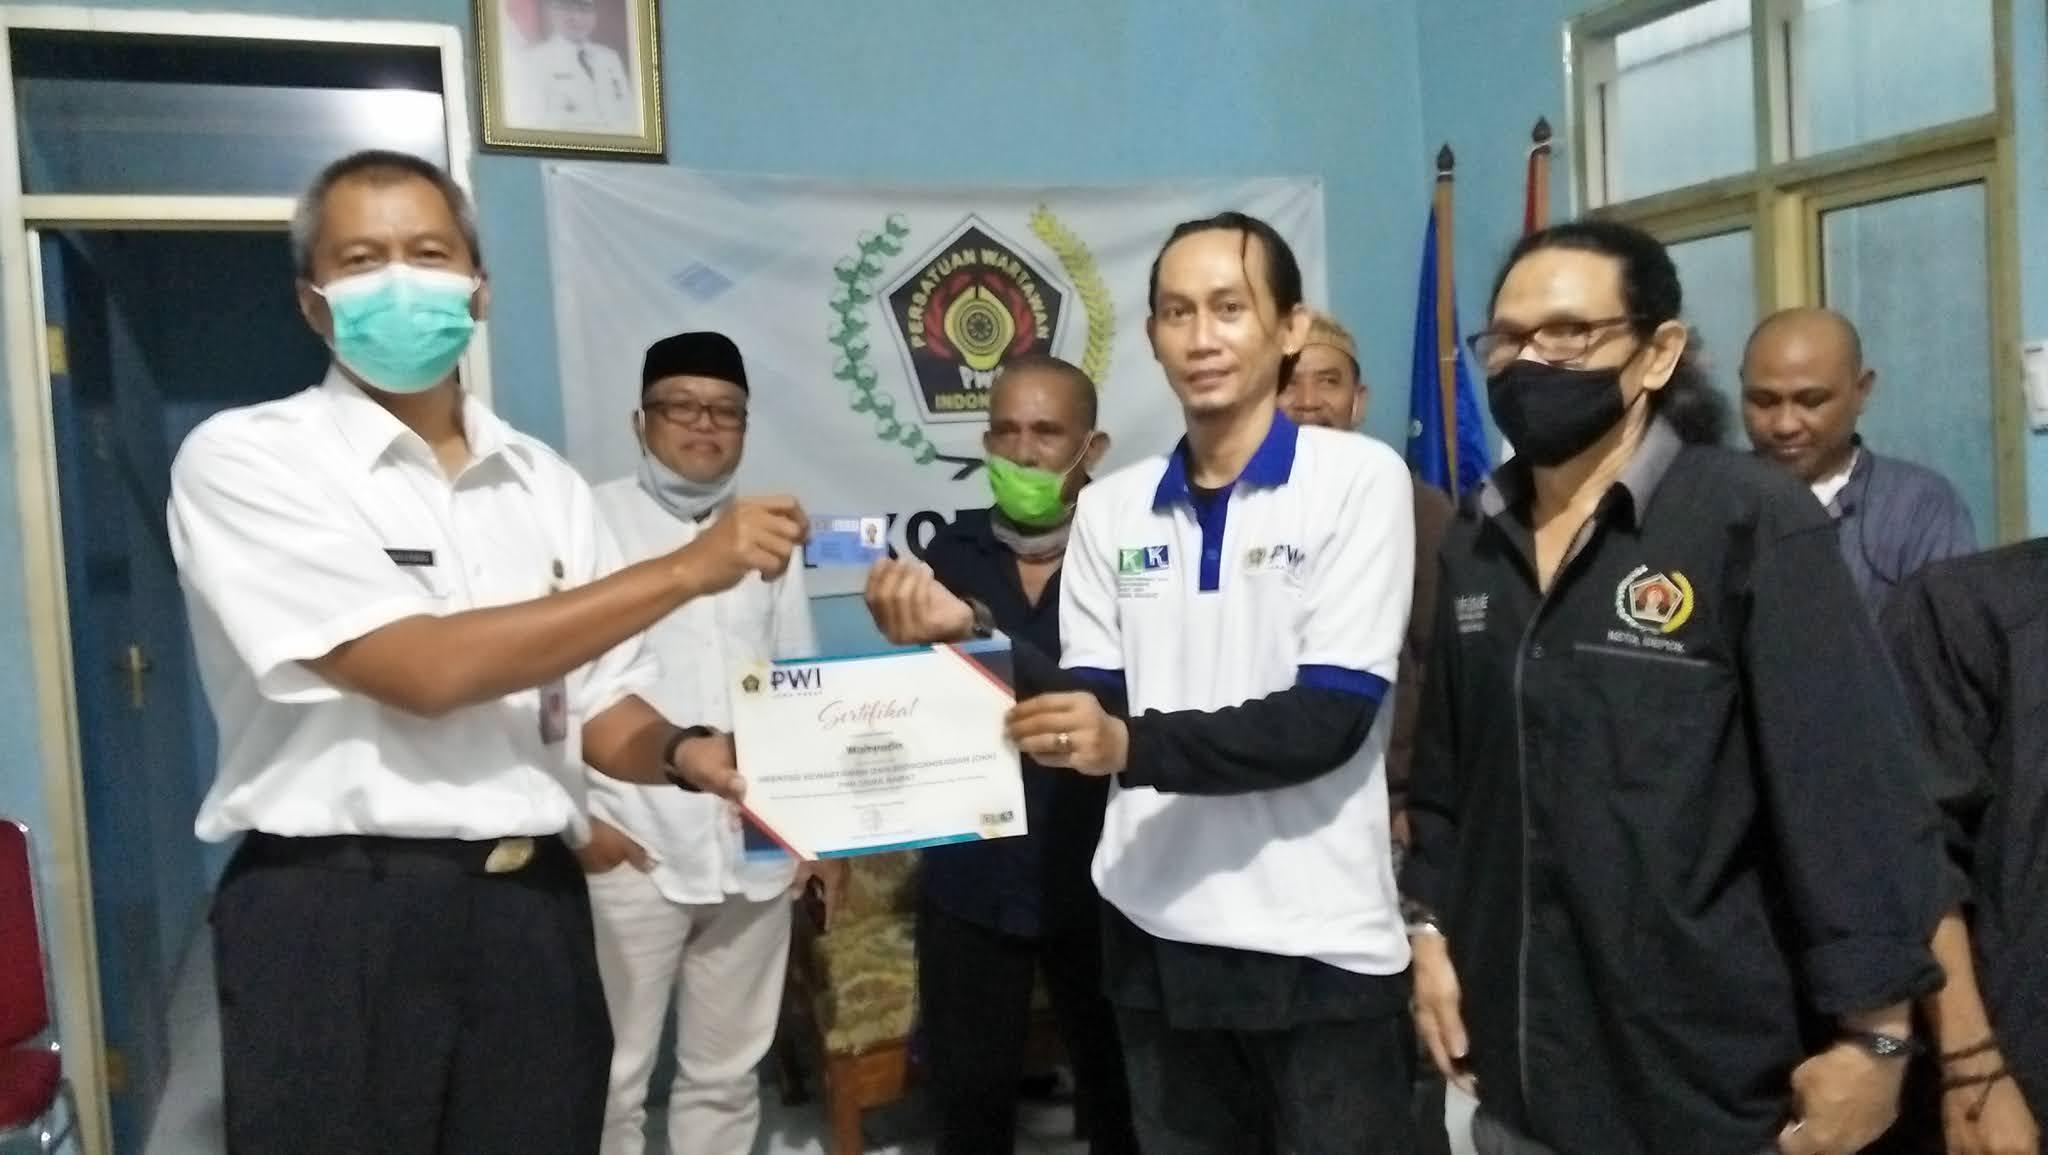 Setelah Lulus OKK, Tujuh Wartawan Resmi Jadi Anggota Baru PWI Depok